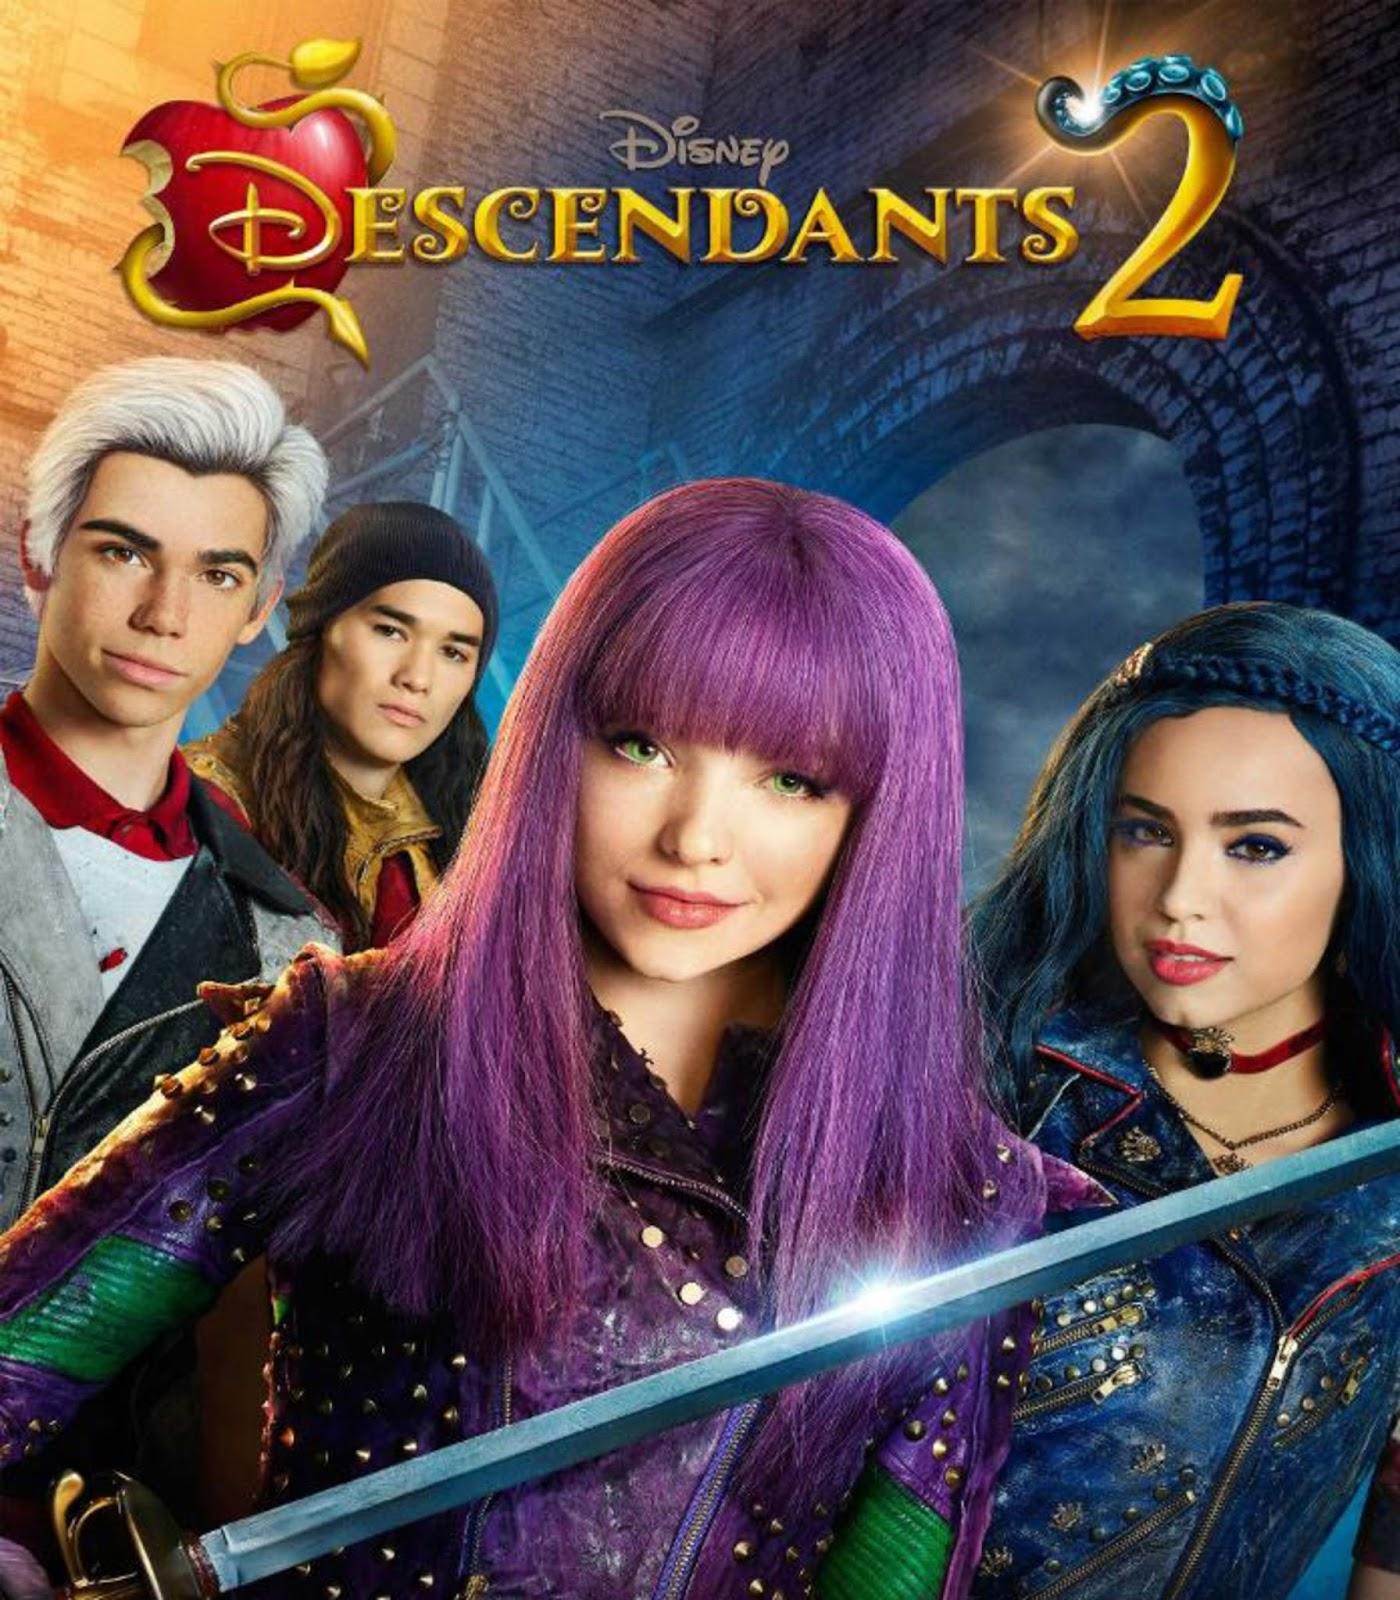 Capa Descendentes 2 Torrent 720p 1080p 4k Dublado Baixar